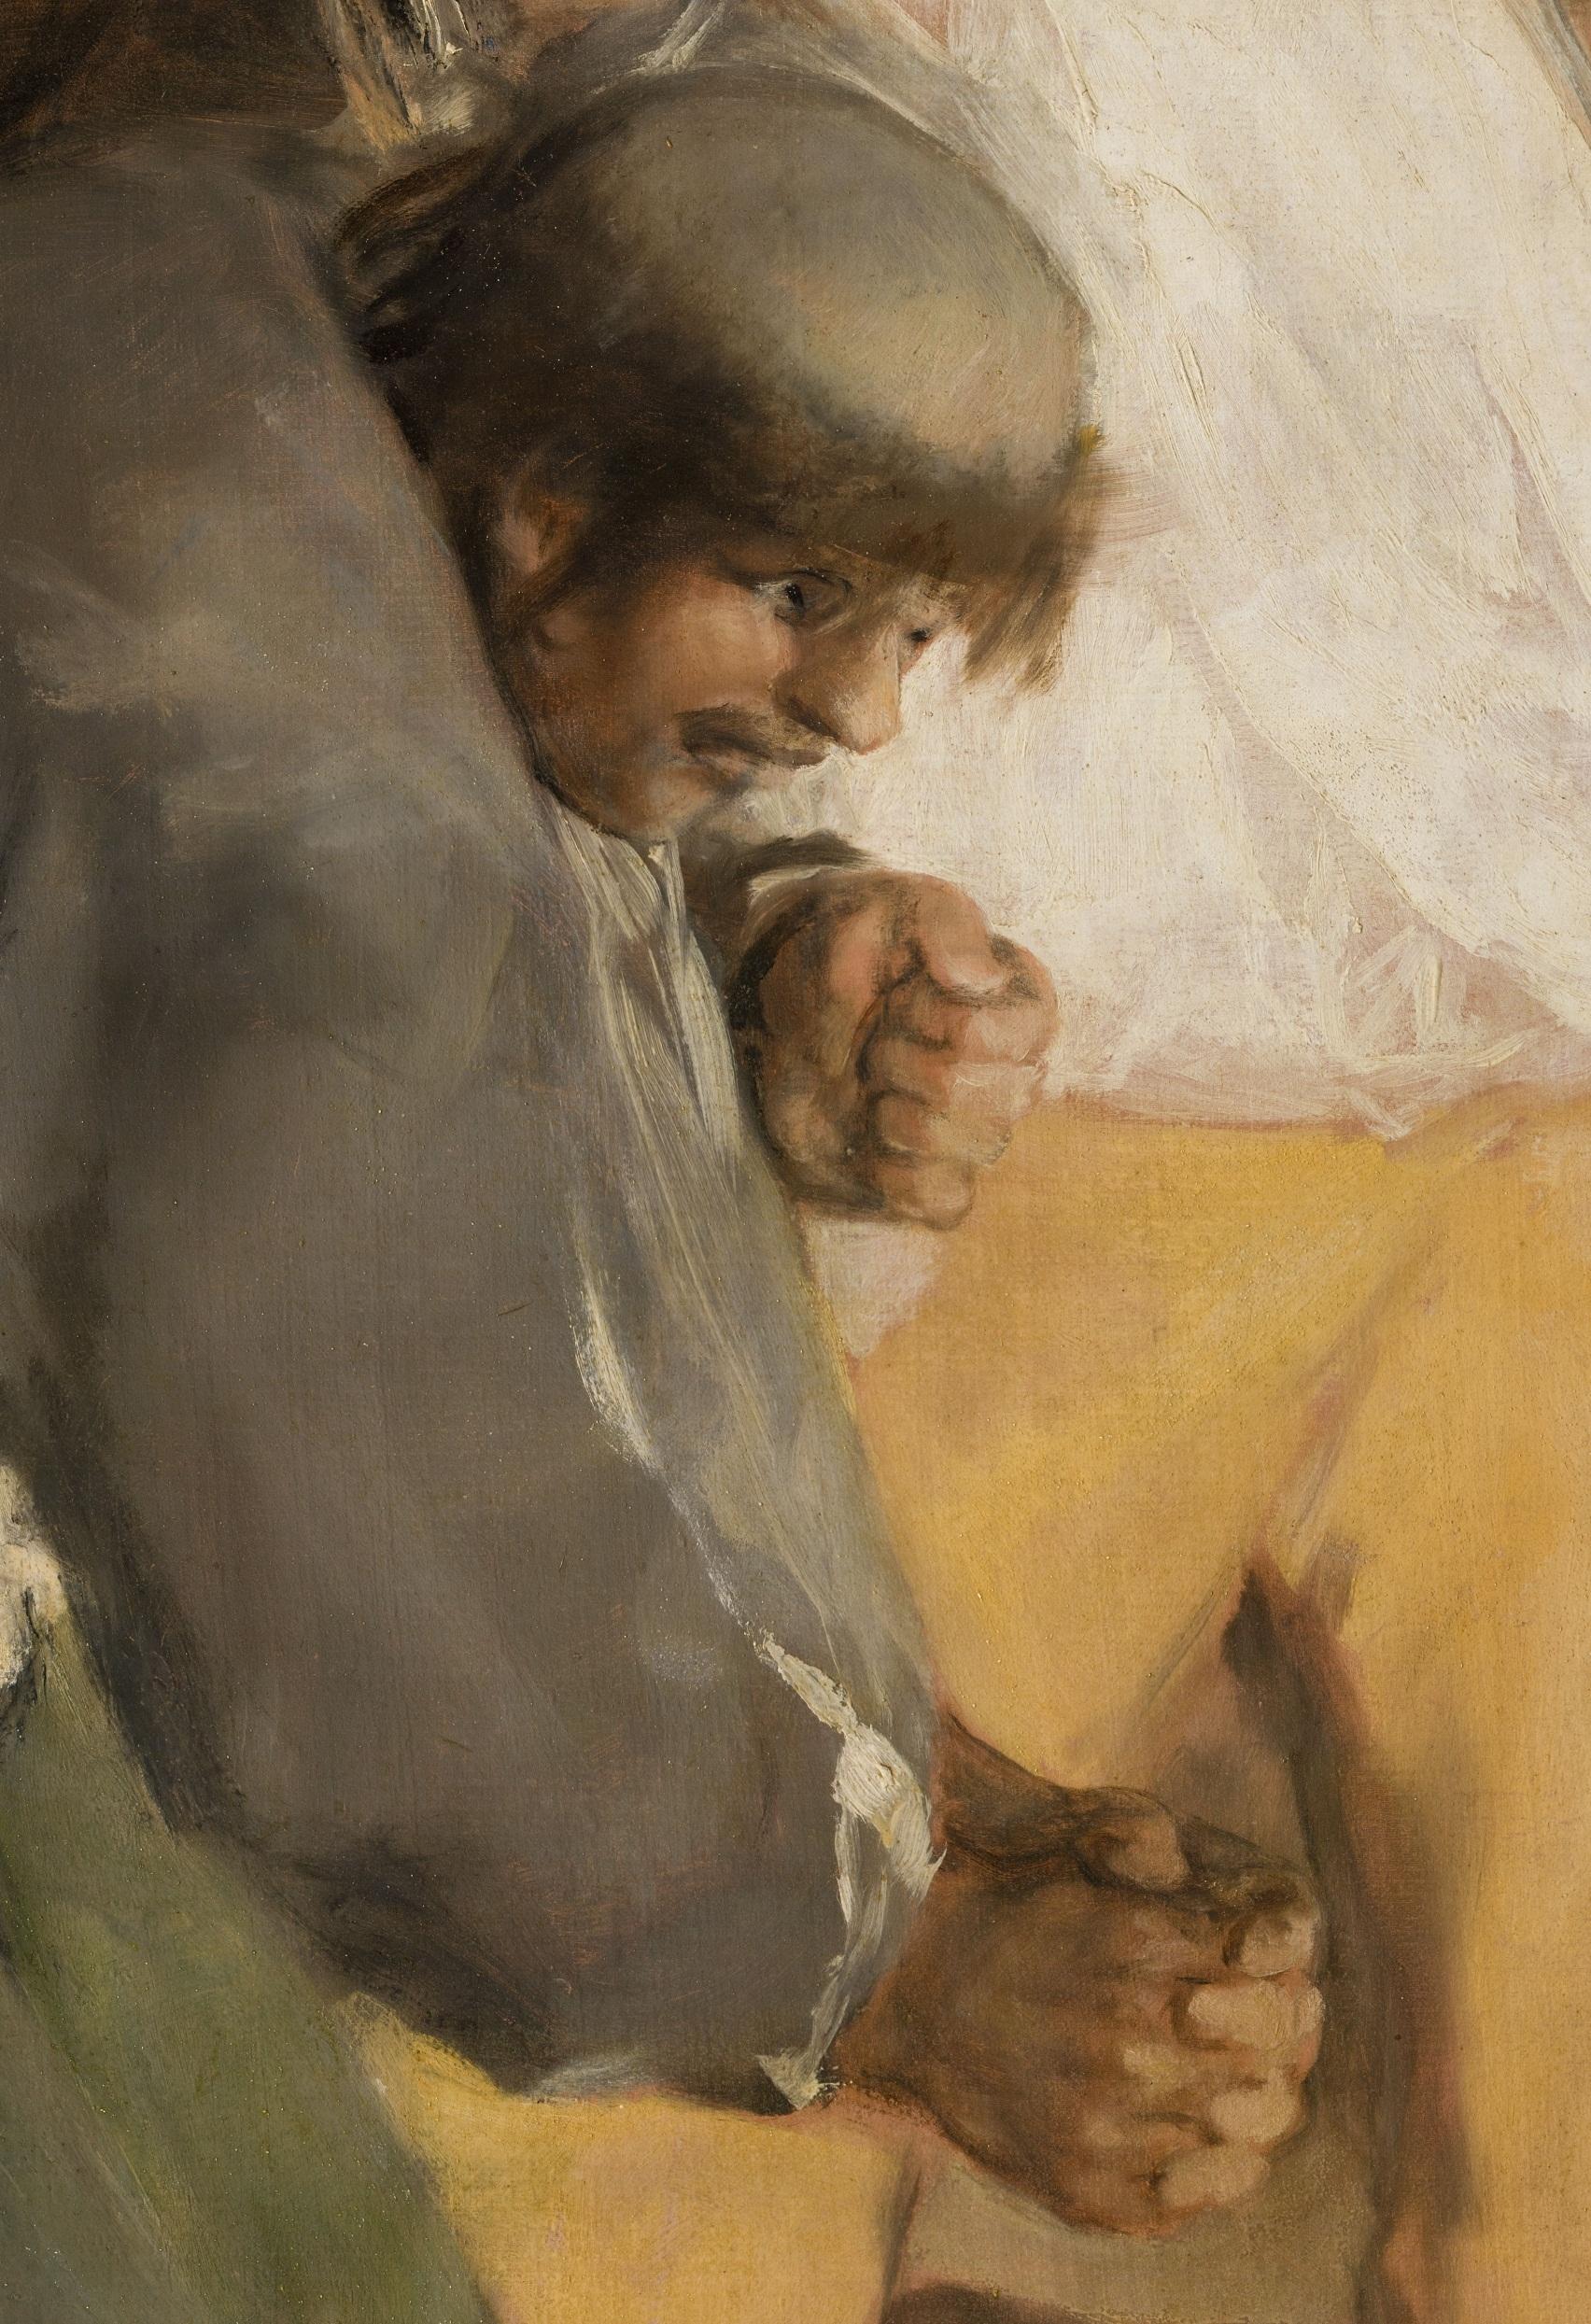 Goya 3may monk.jpg